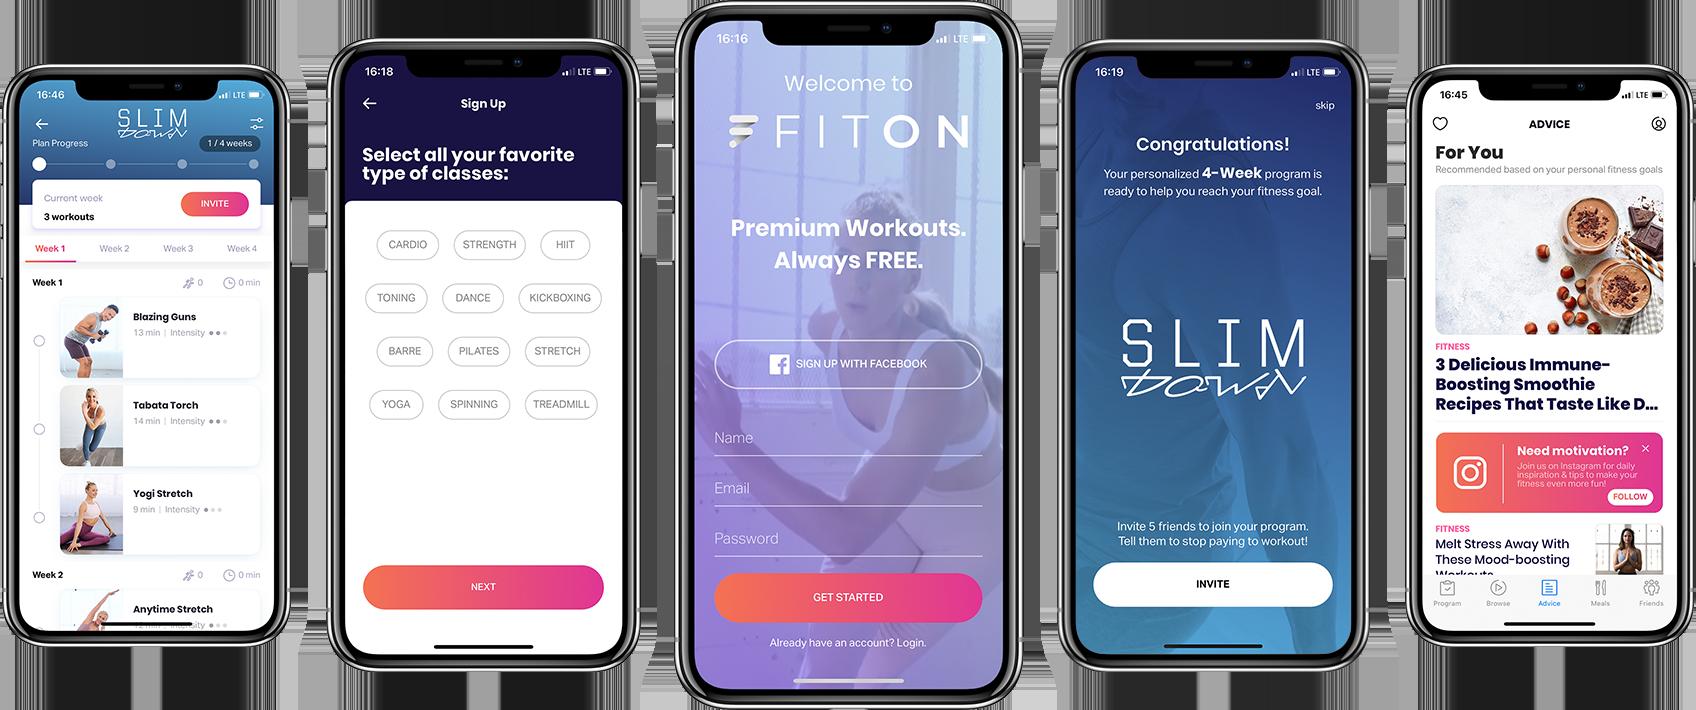 screenshots of the FitOn app